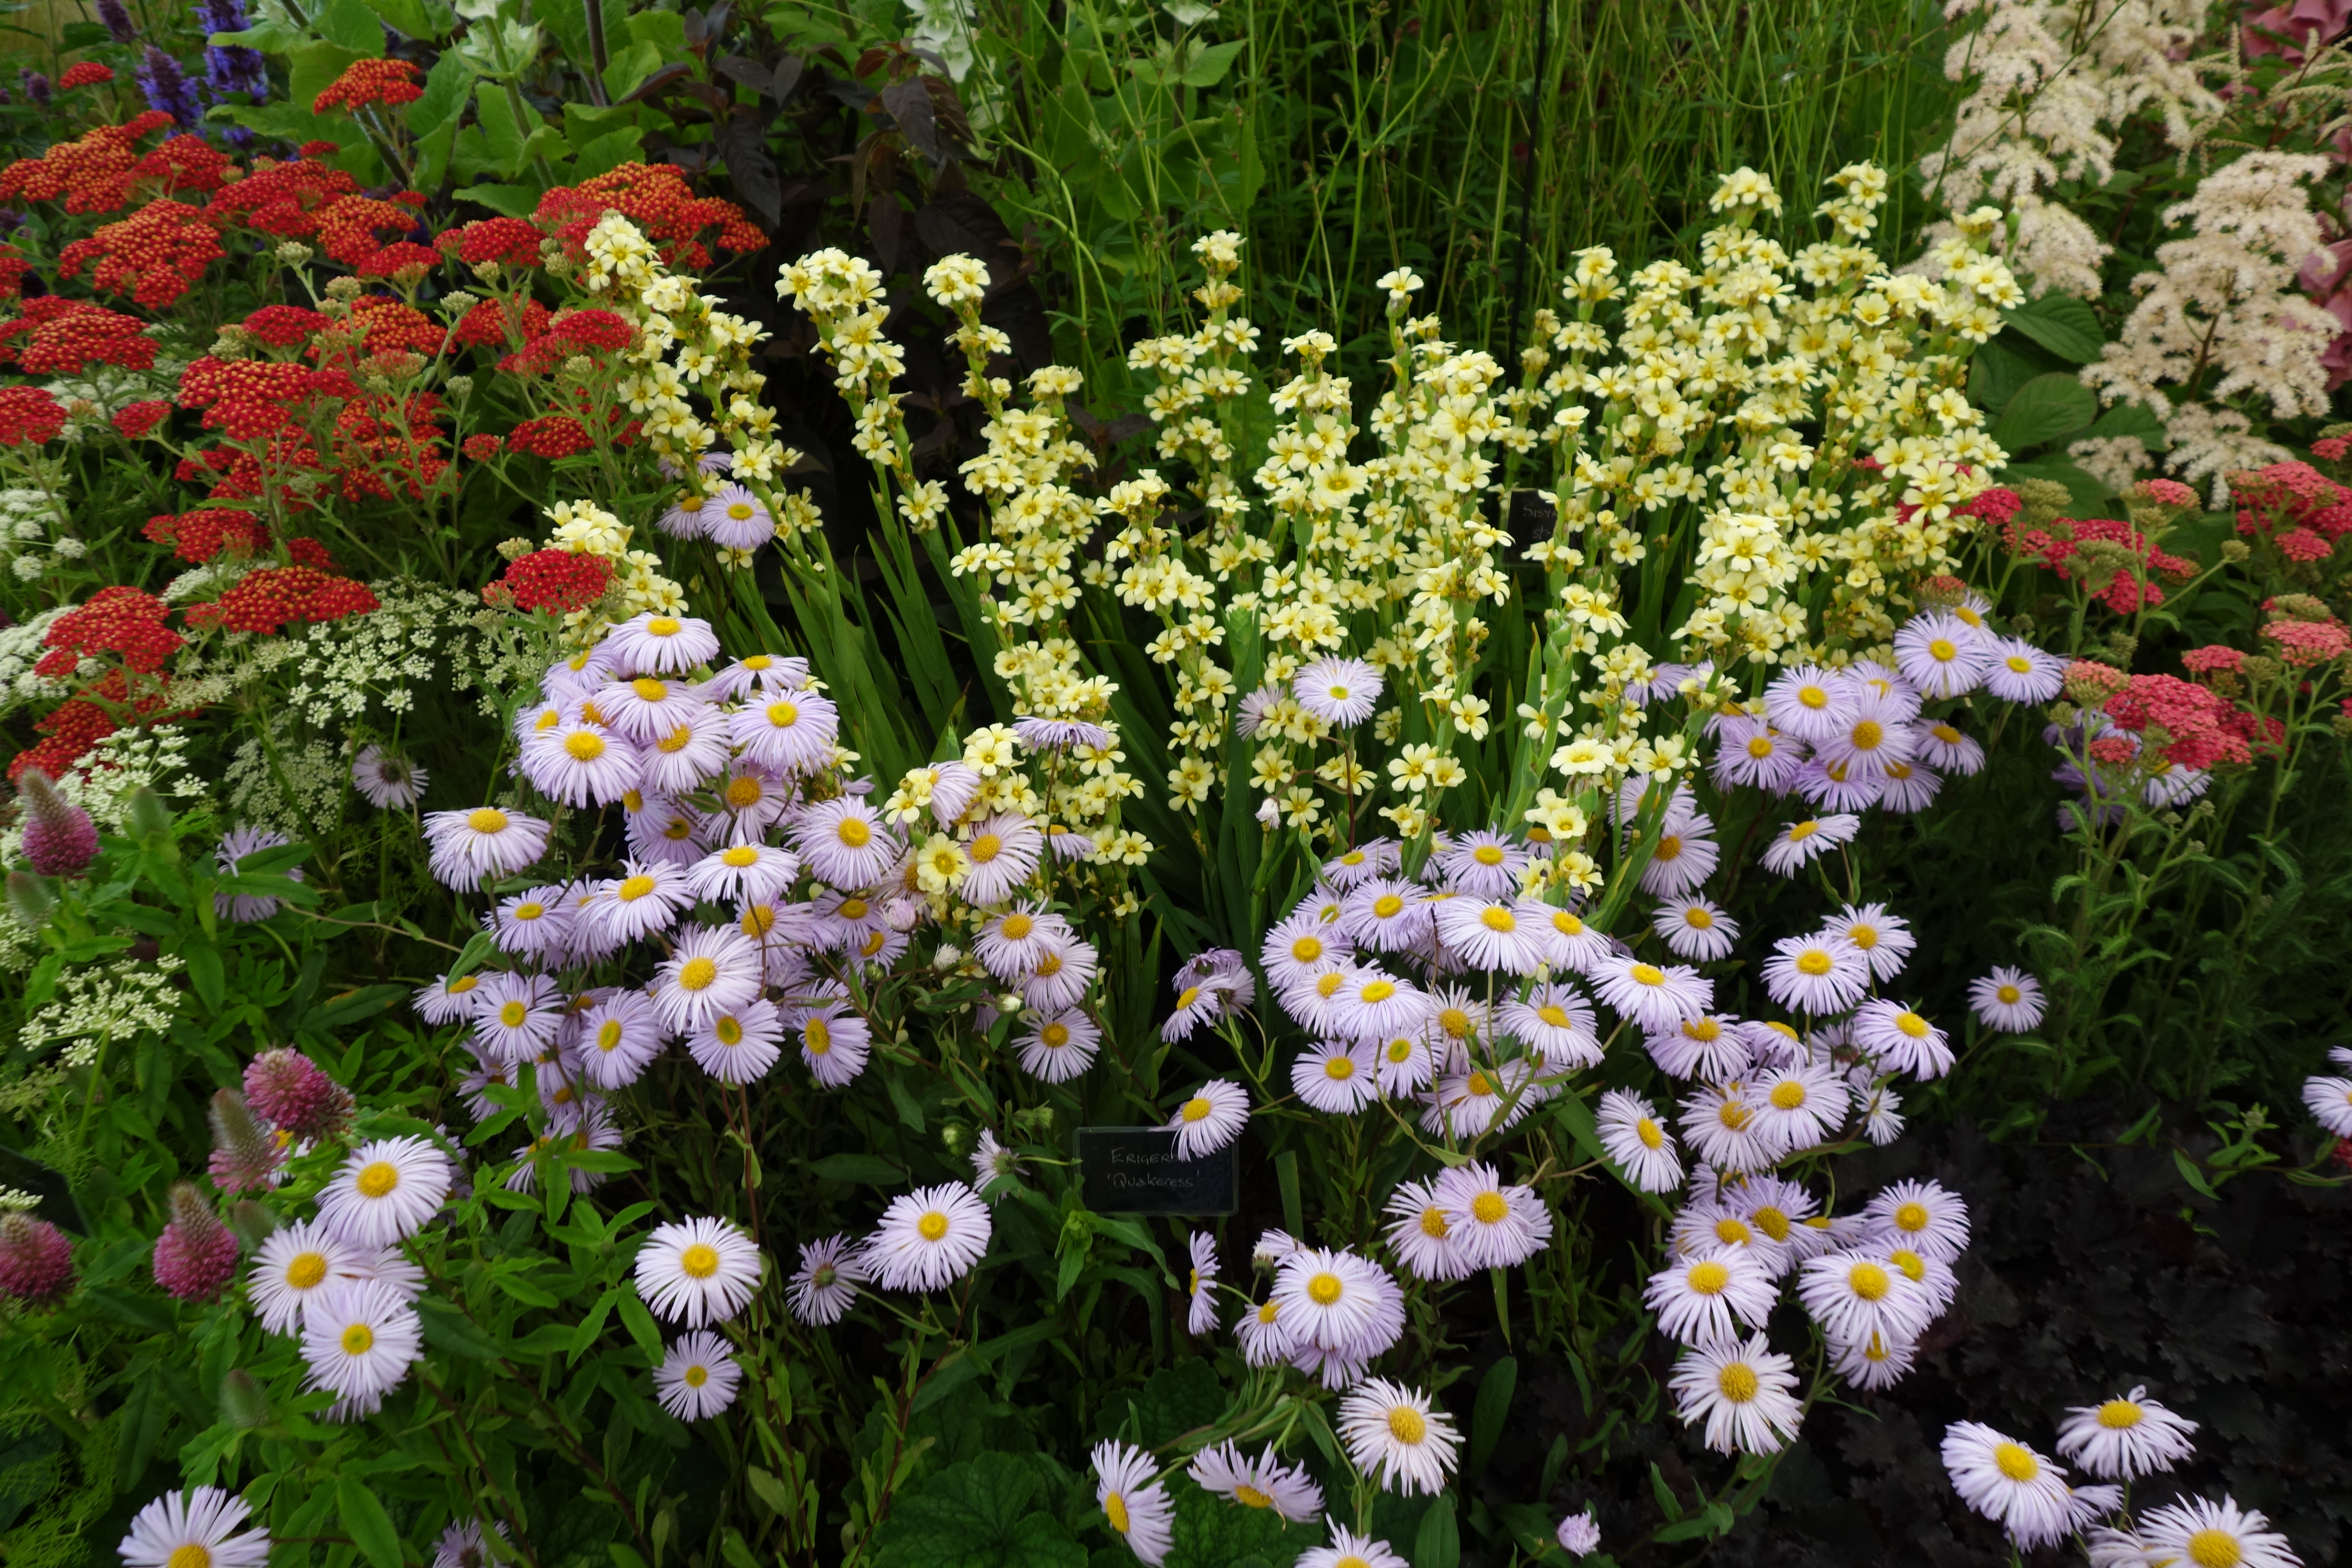 Rhs hampton court flower show 2015 the surrey edit - Hampton court flower show ...